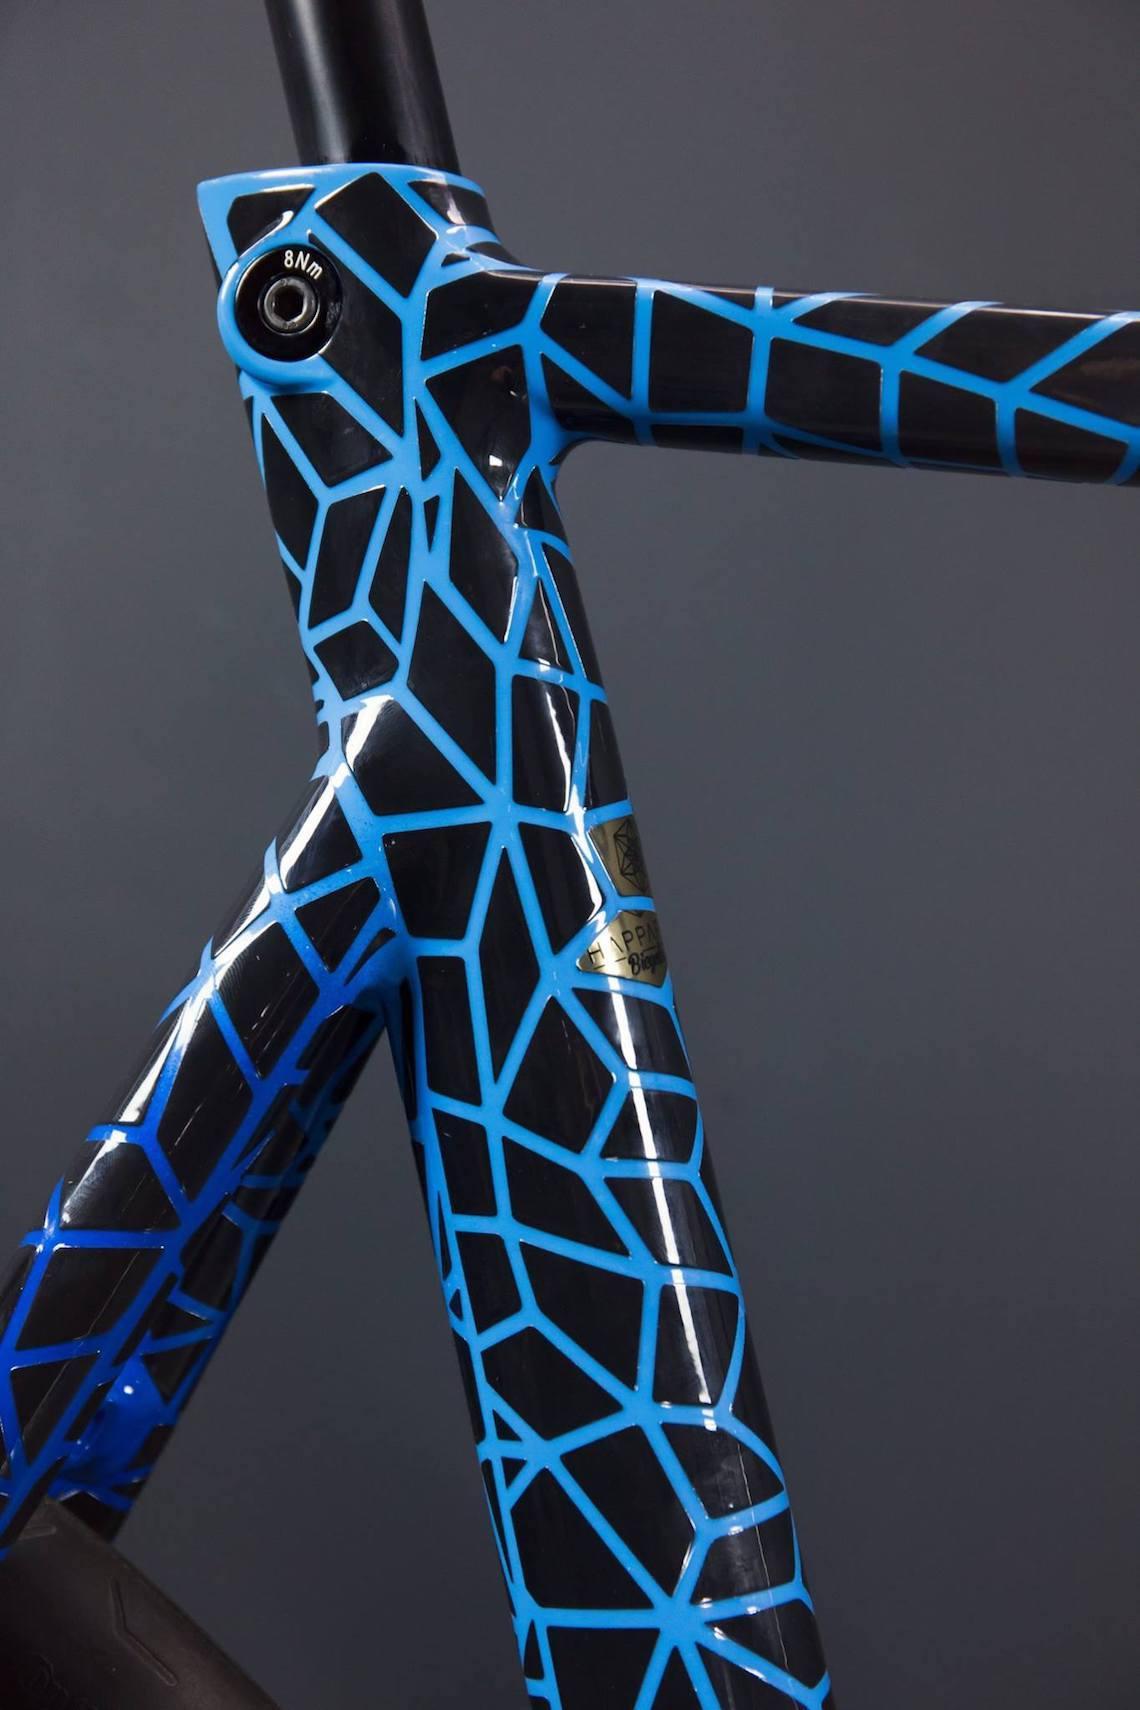 Happarel Bicycles x Schindelhauer_urbancycling_2